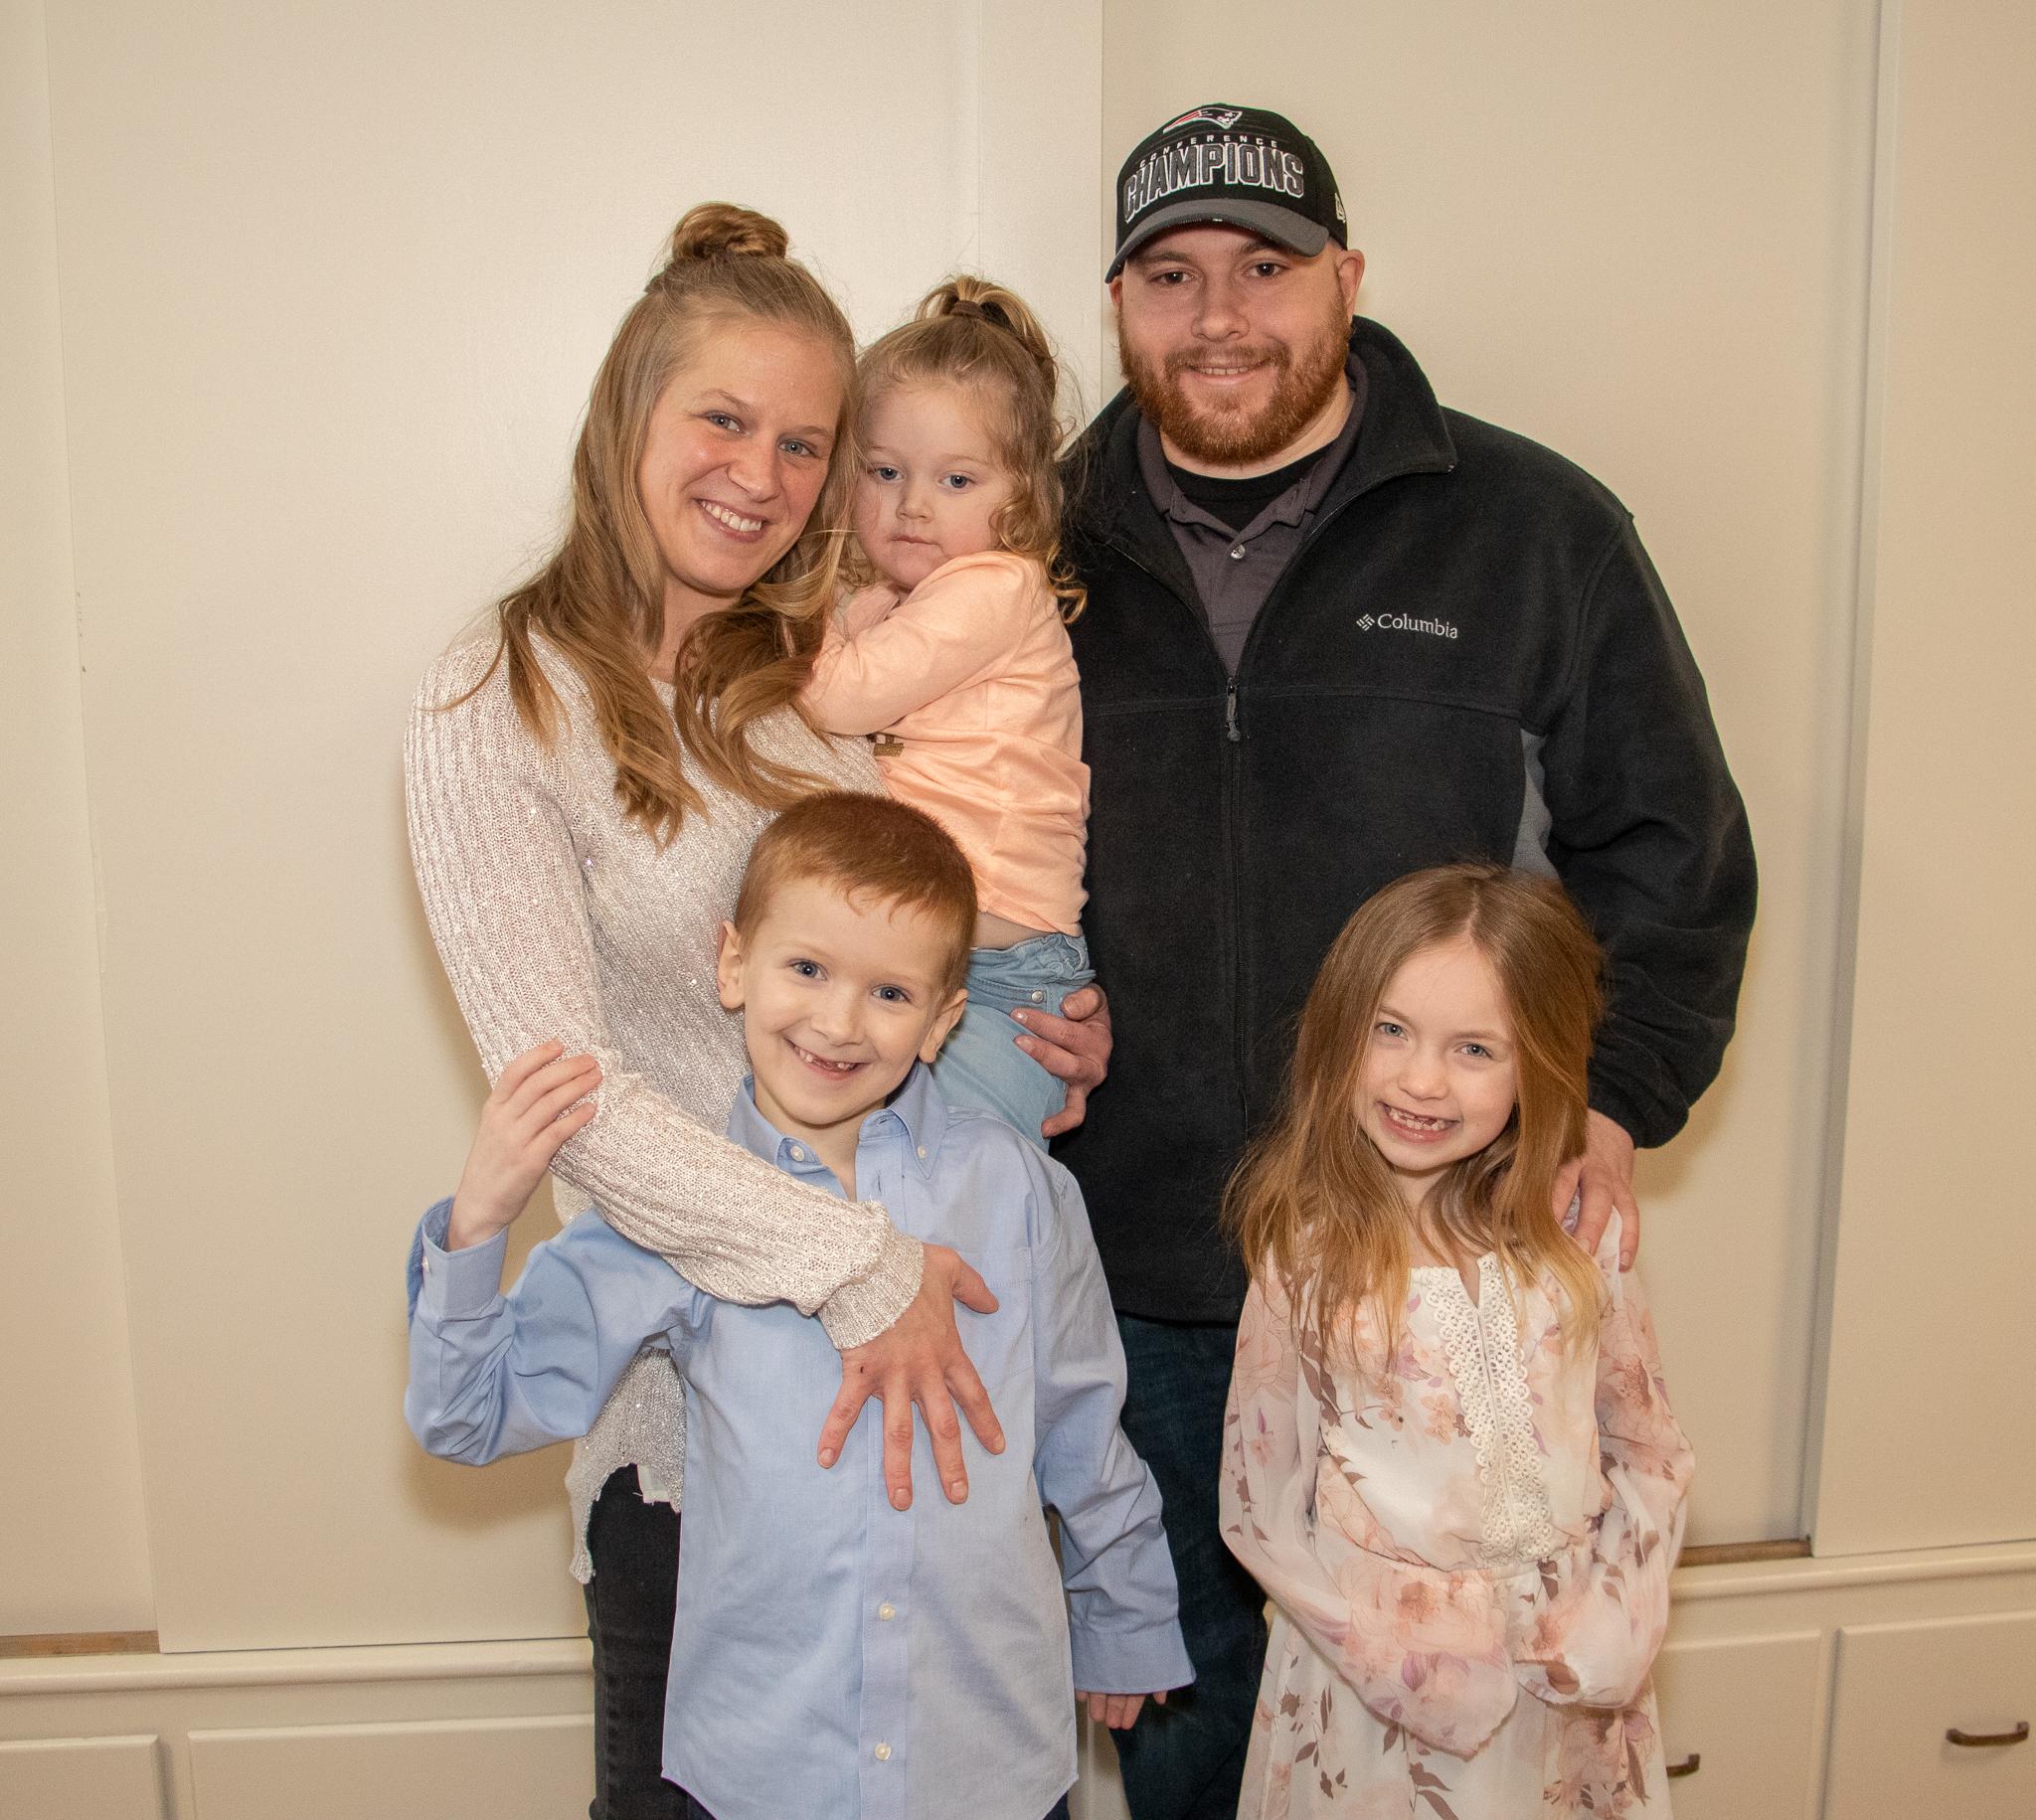 Partner family for one of the 2 Veterans homes on Long Pond Road